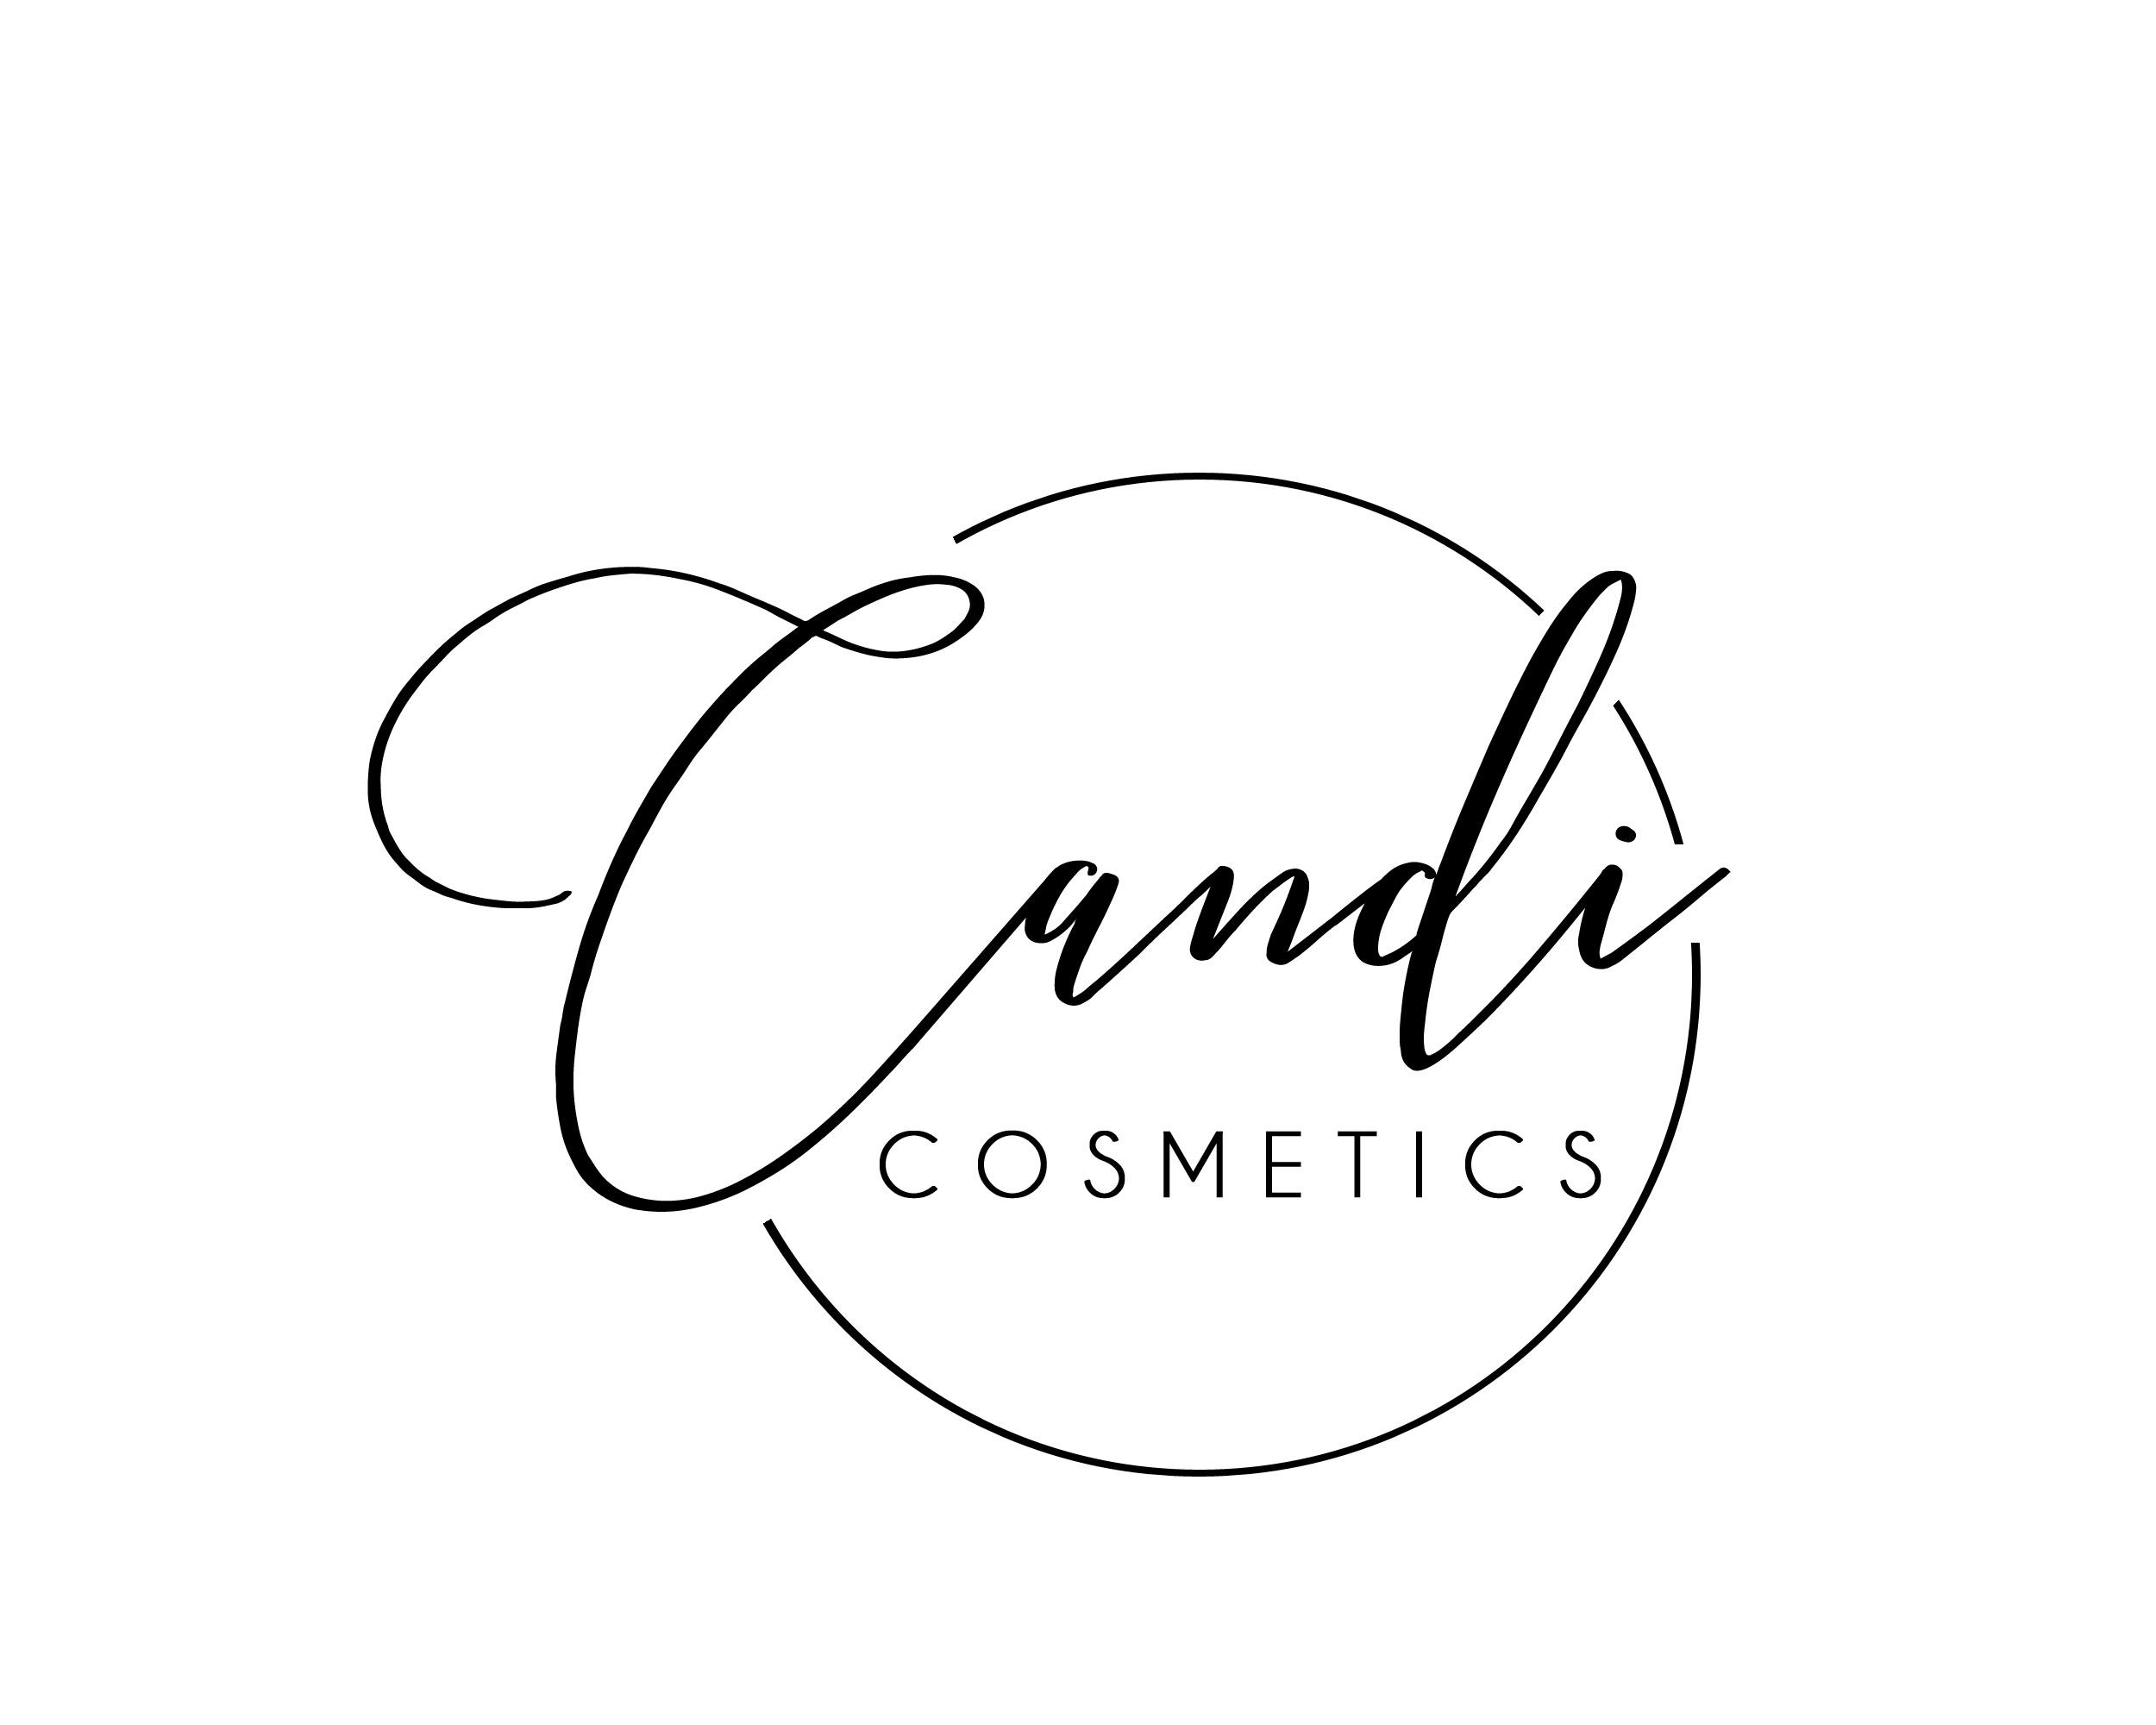 Candi Cosmetics copy.jpg